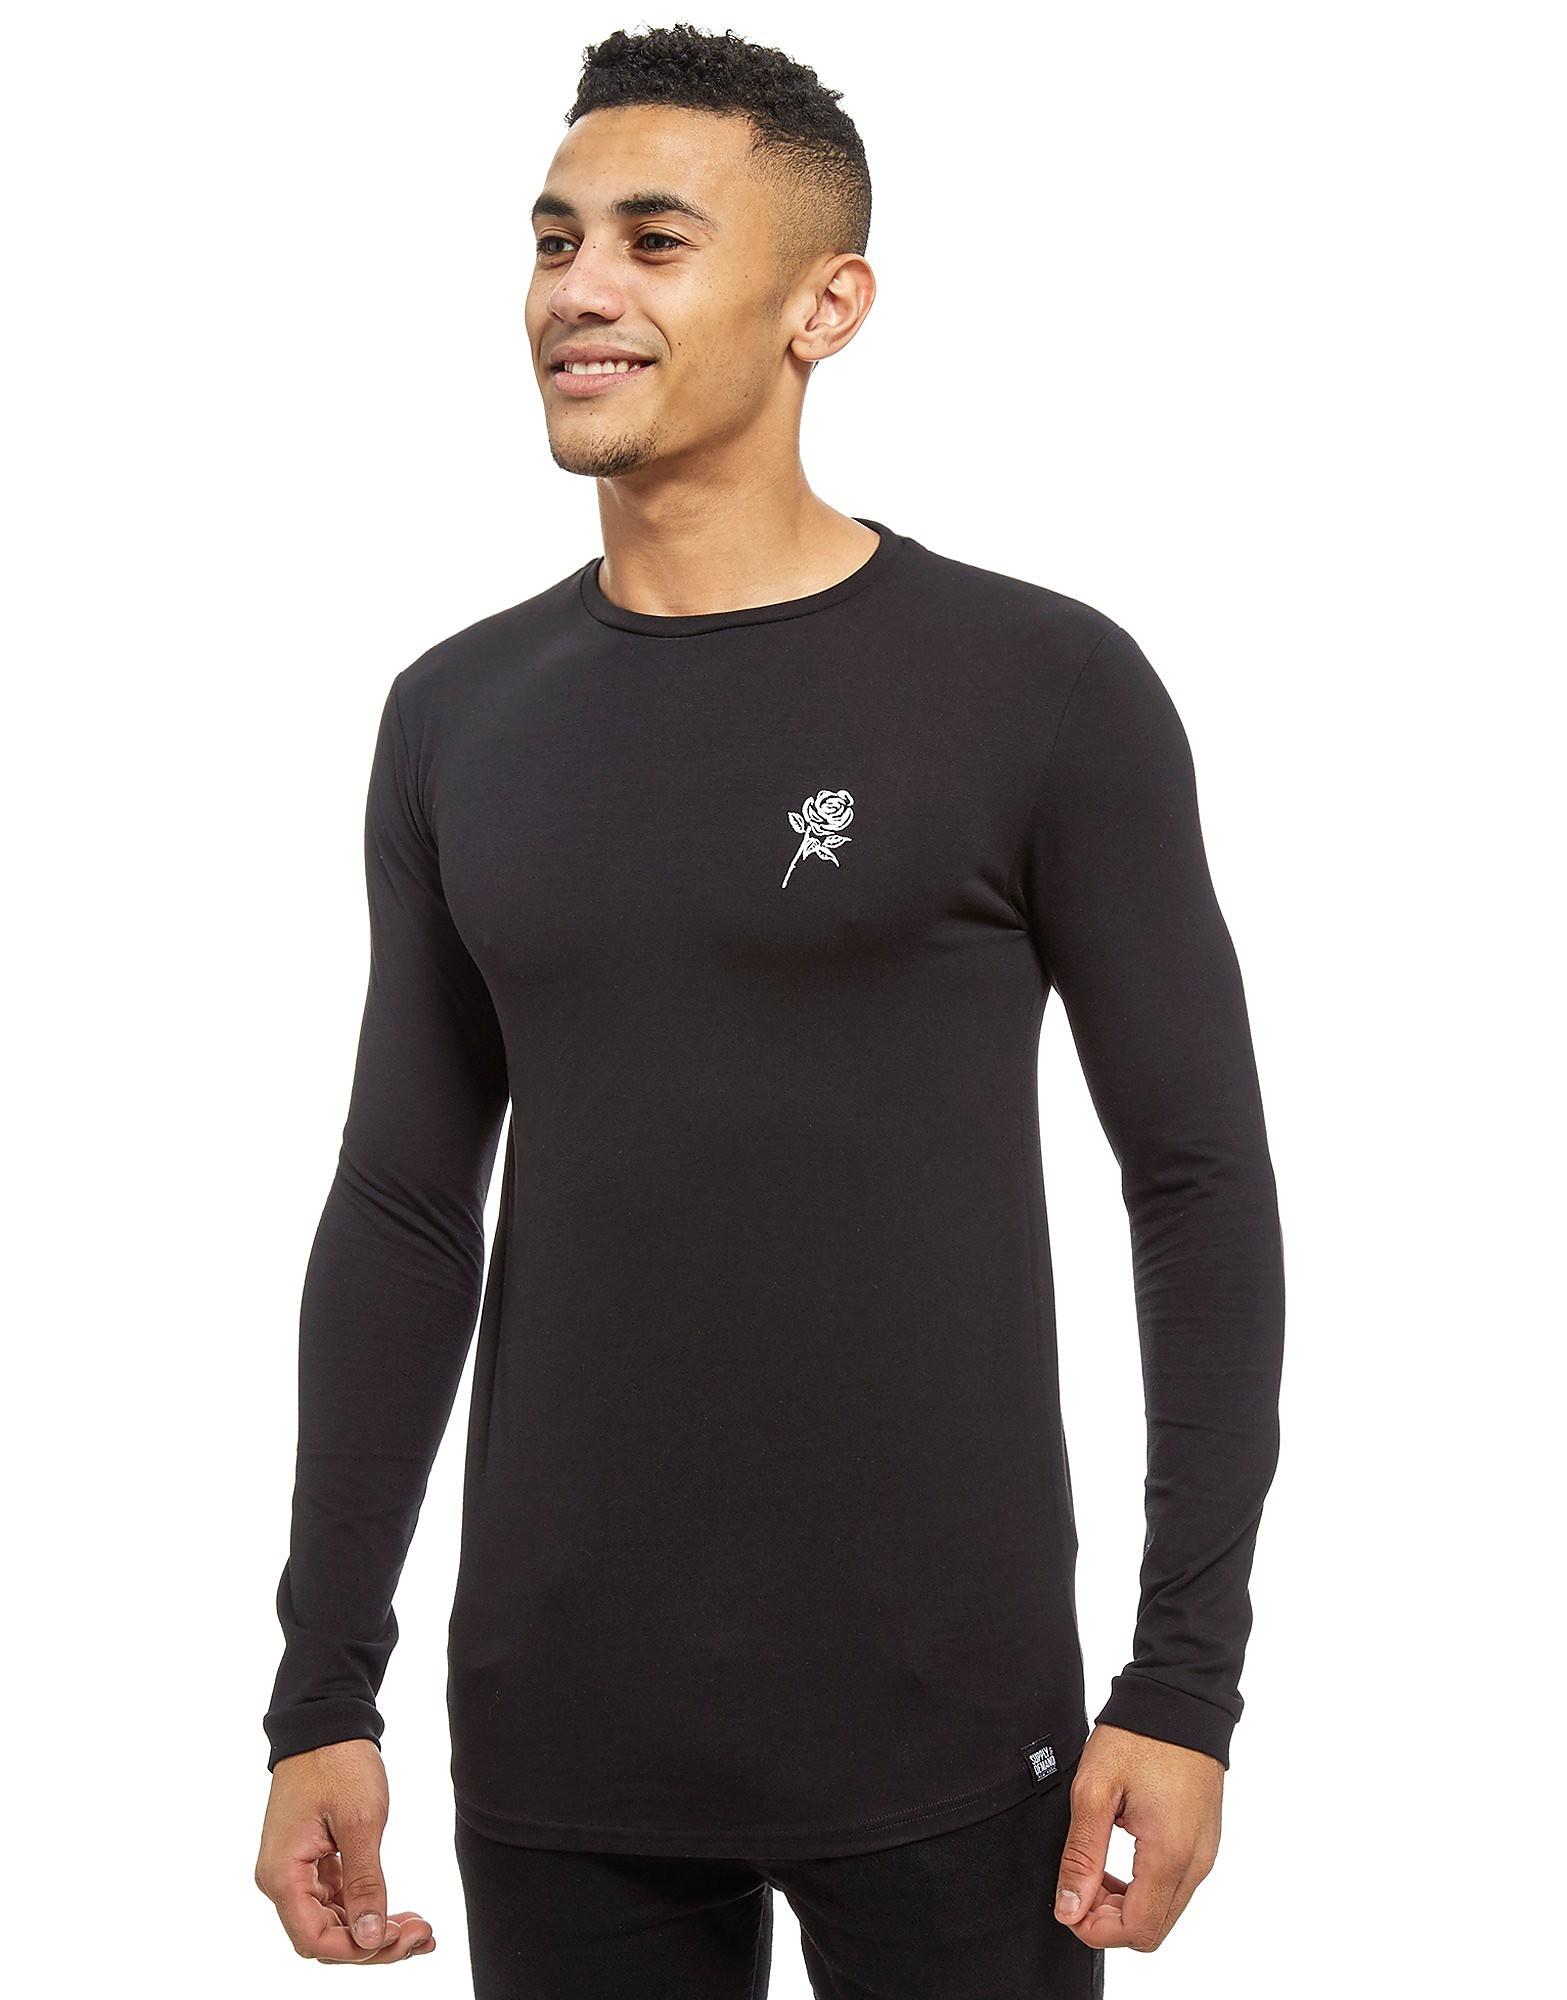 Supply & Demand Reps T-Shirt - Only at JD, Black